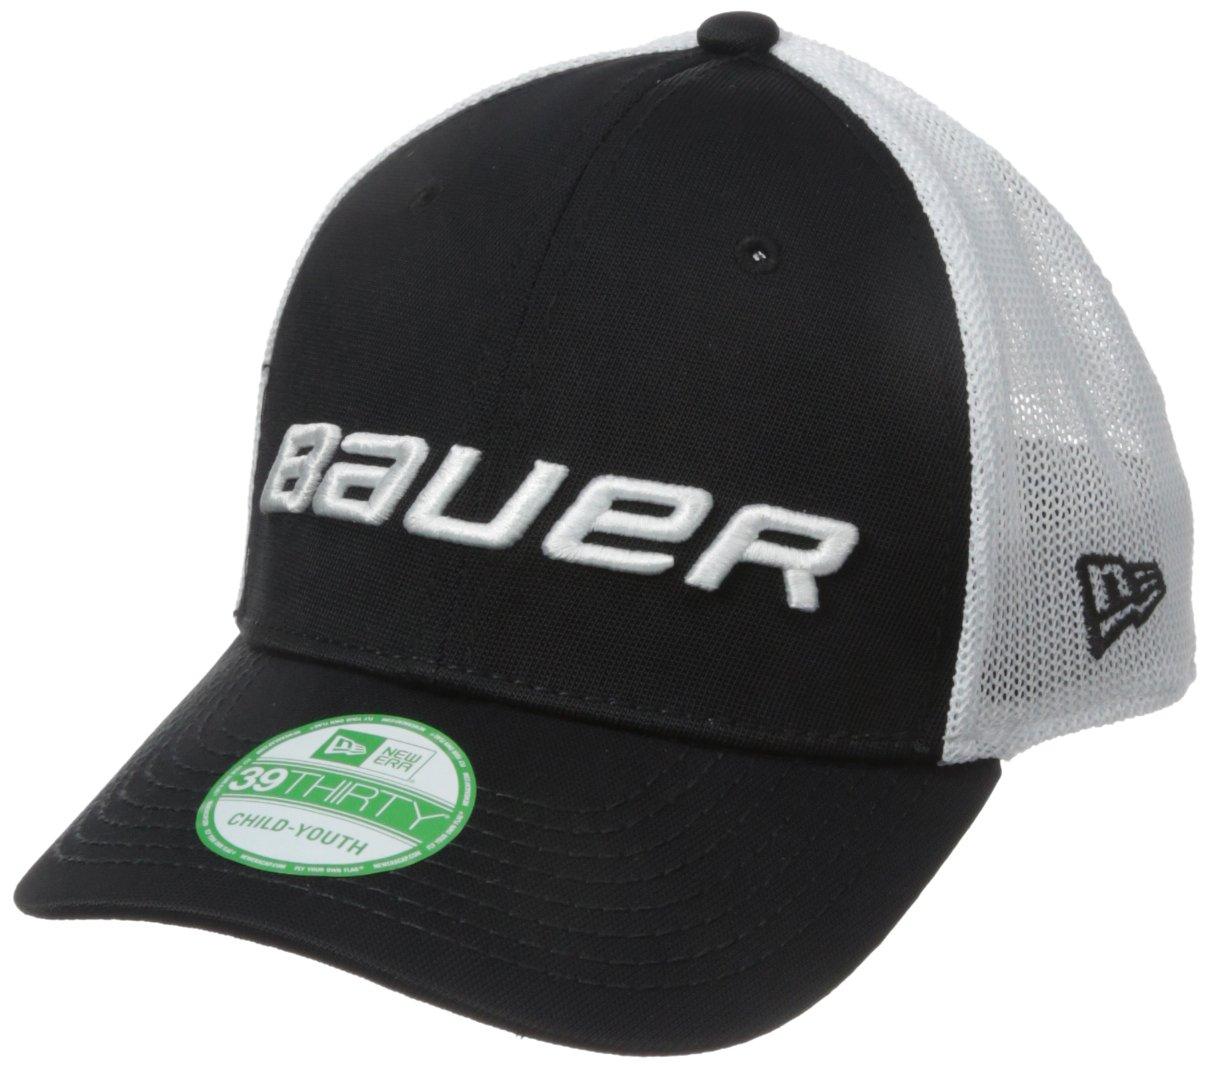 288b88c0 Bauer Men's 39Thirty Mesh Back Cap